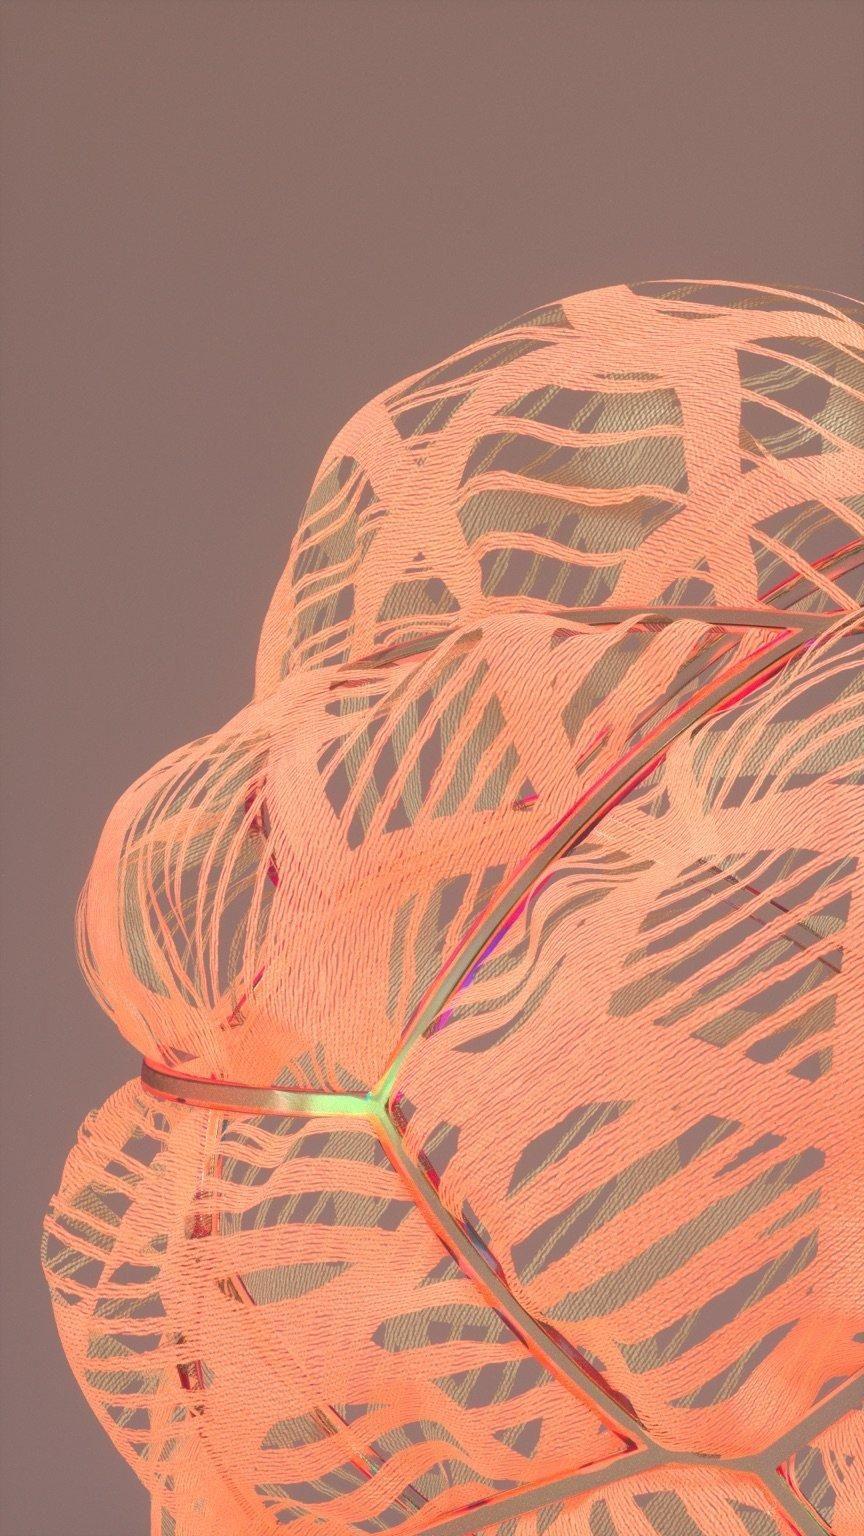 Orange Lace - image 1 - student project